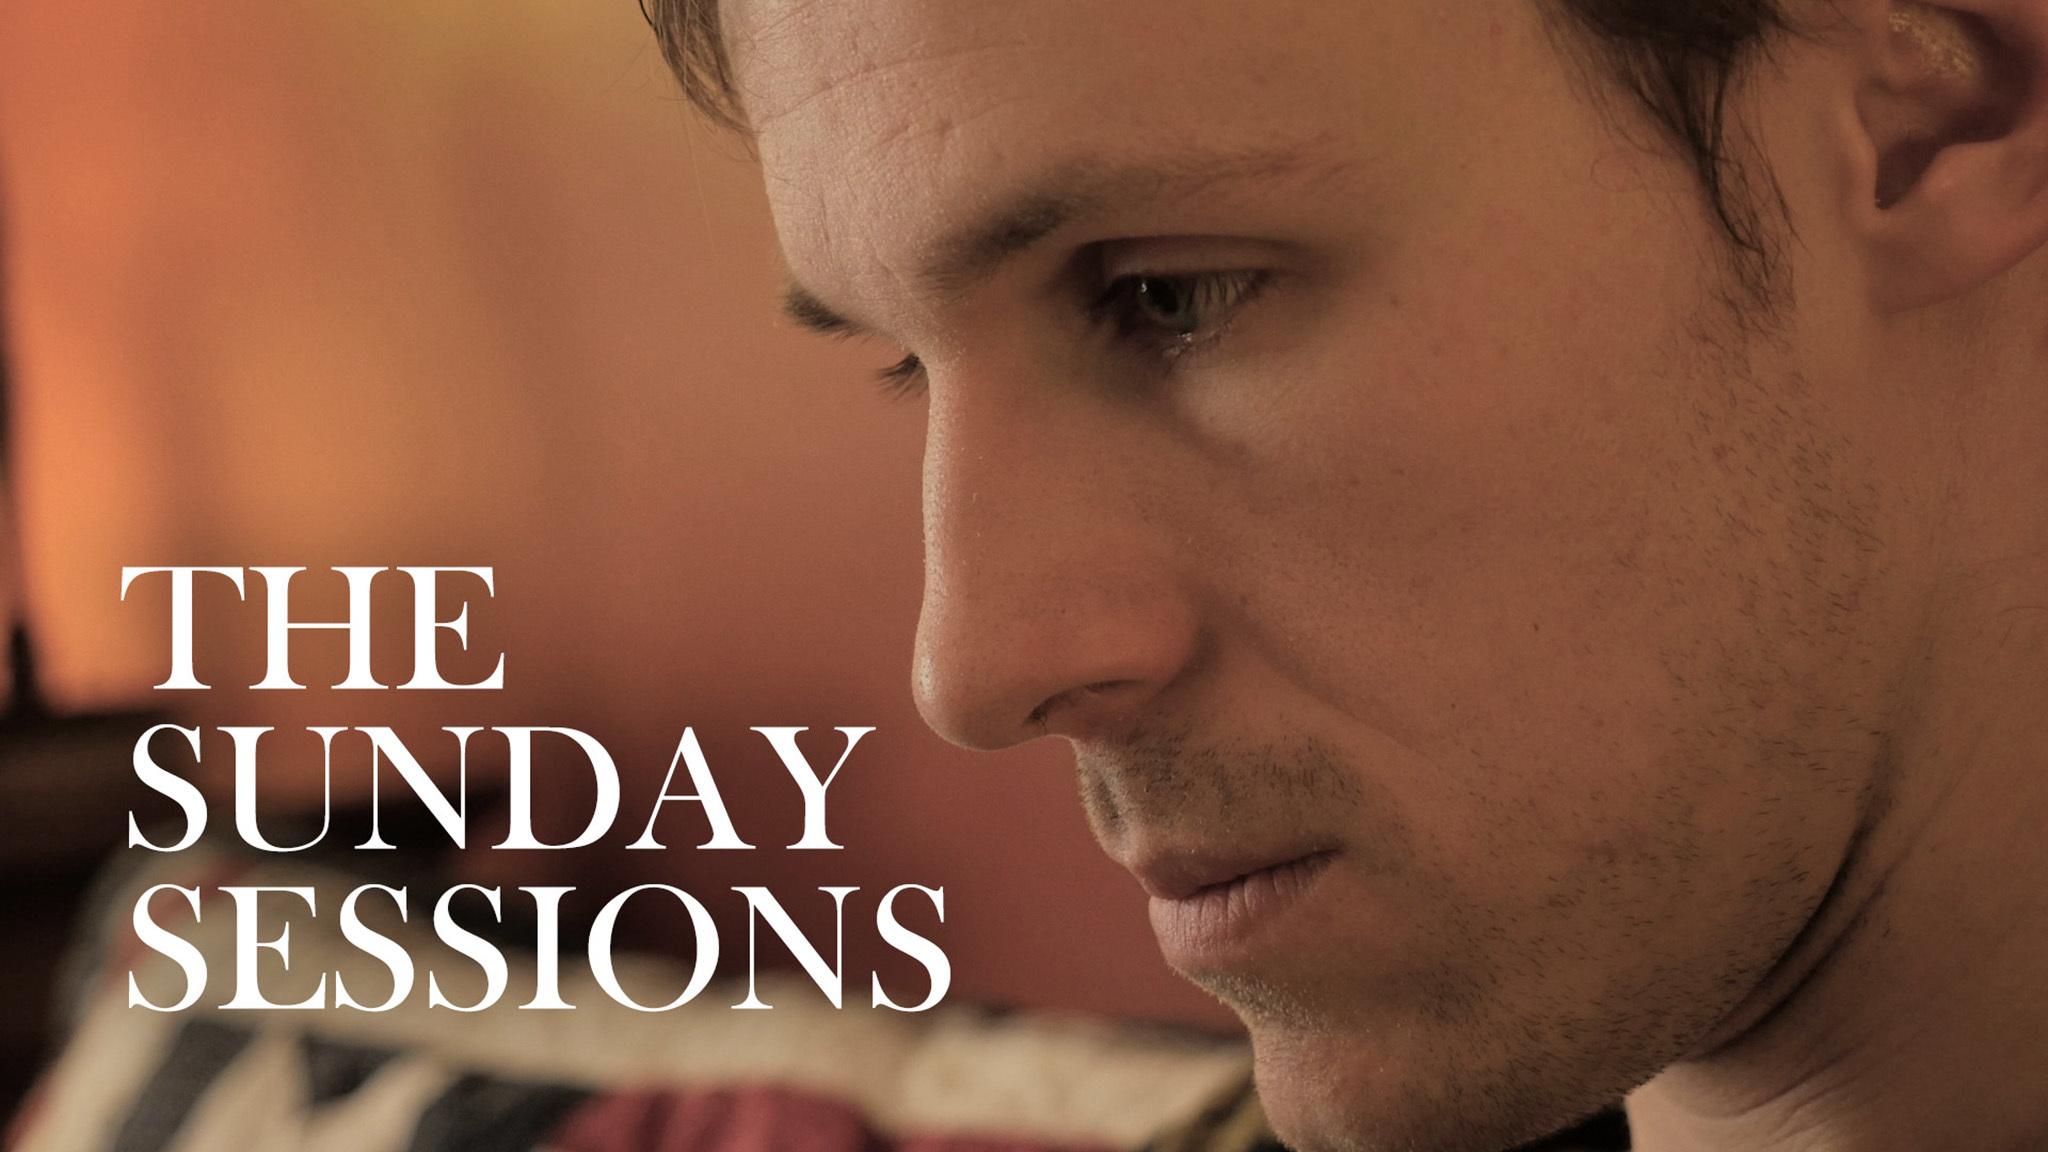 SundaySessions_Key+Art_Horizontal.jpg